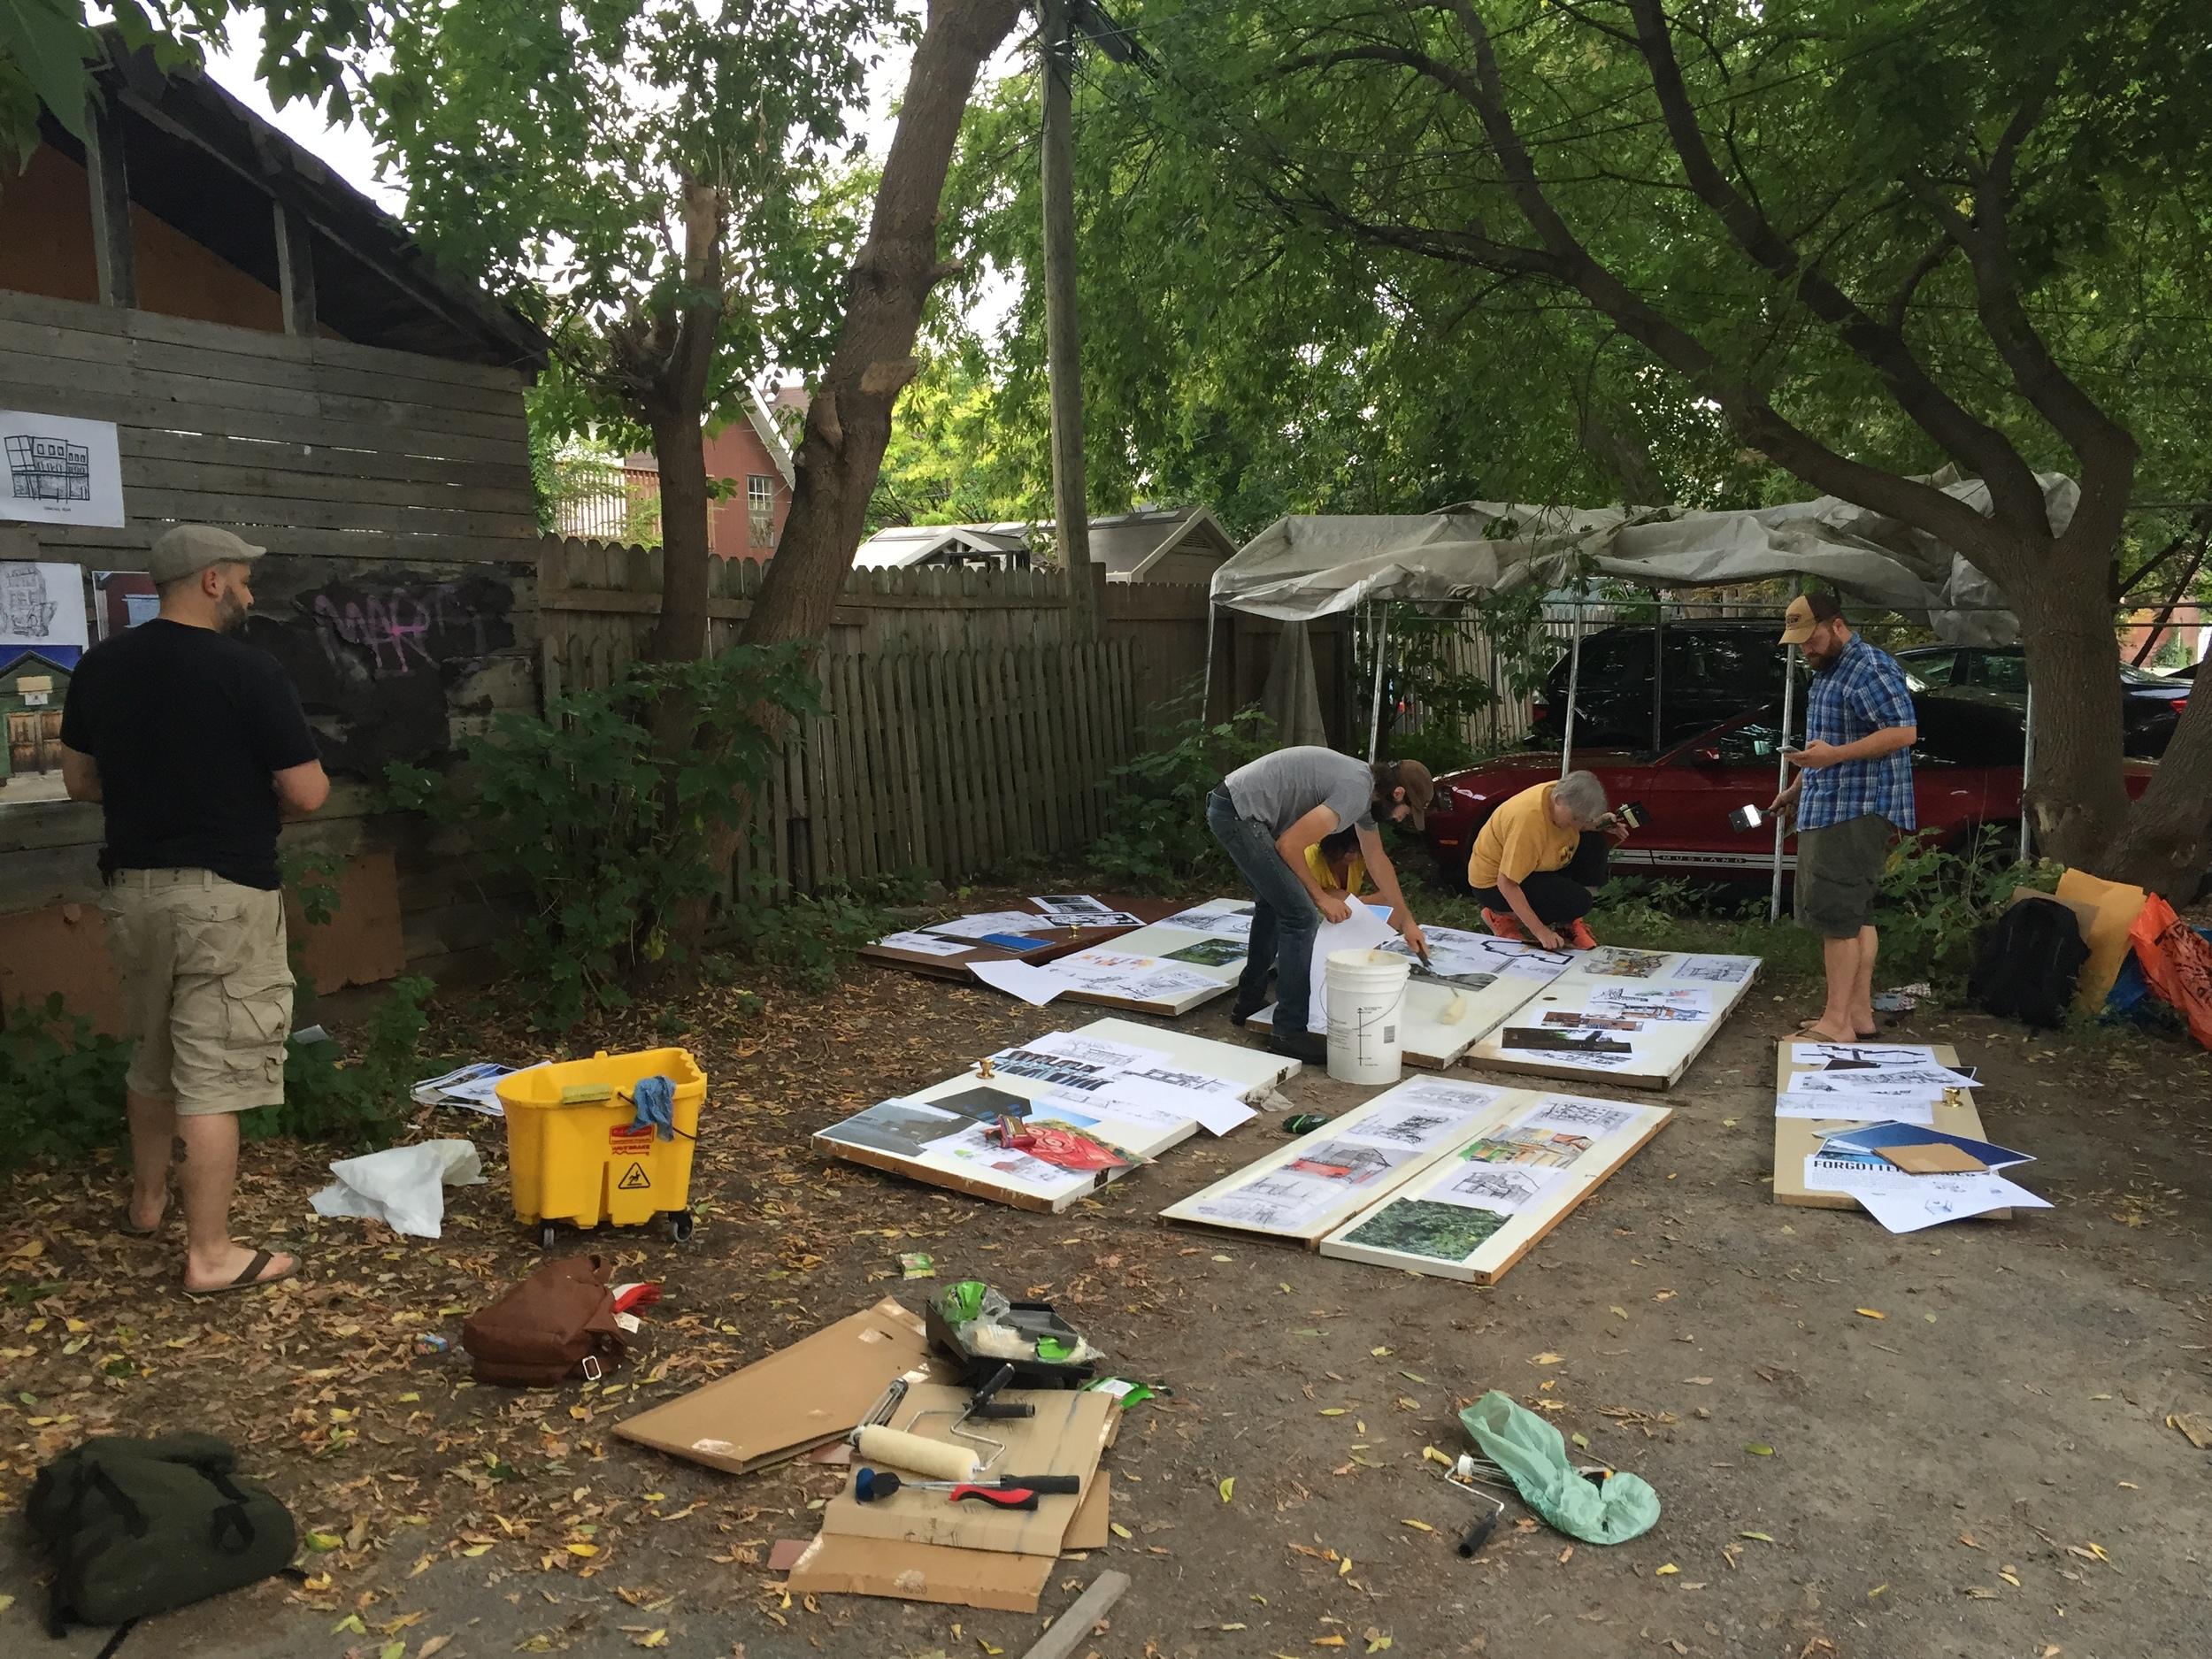 (Stephen, Mawt, Kristina, Cindi and Marc wheat pasting art onto doors)